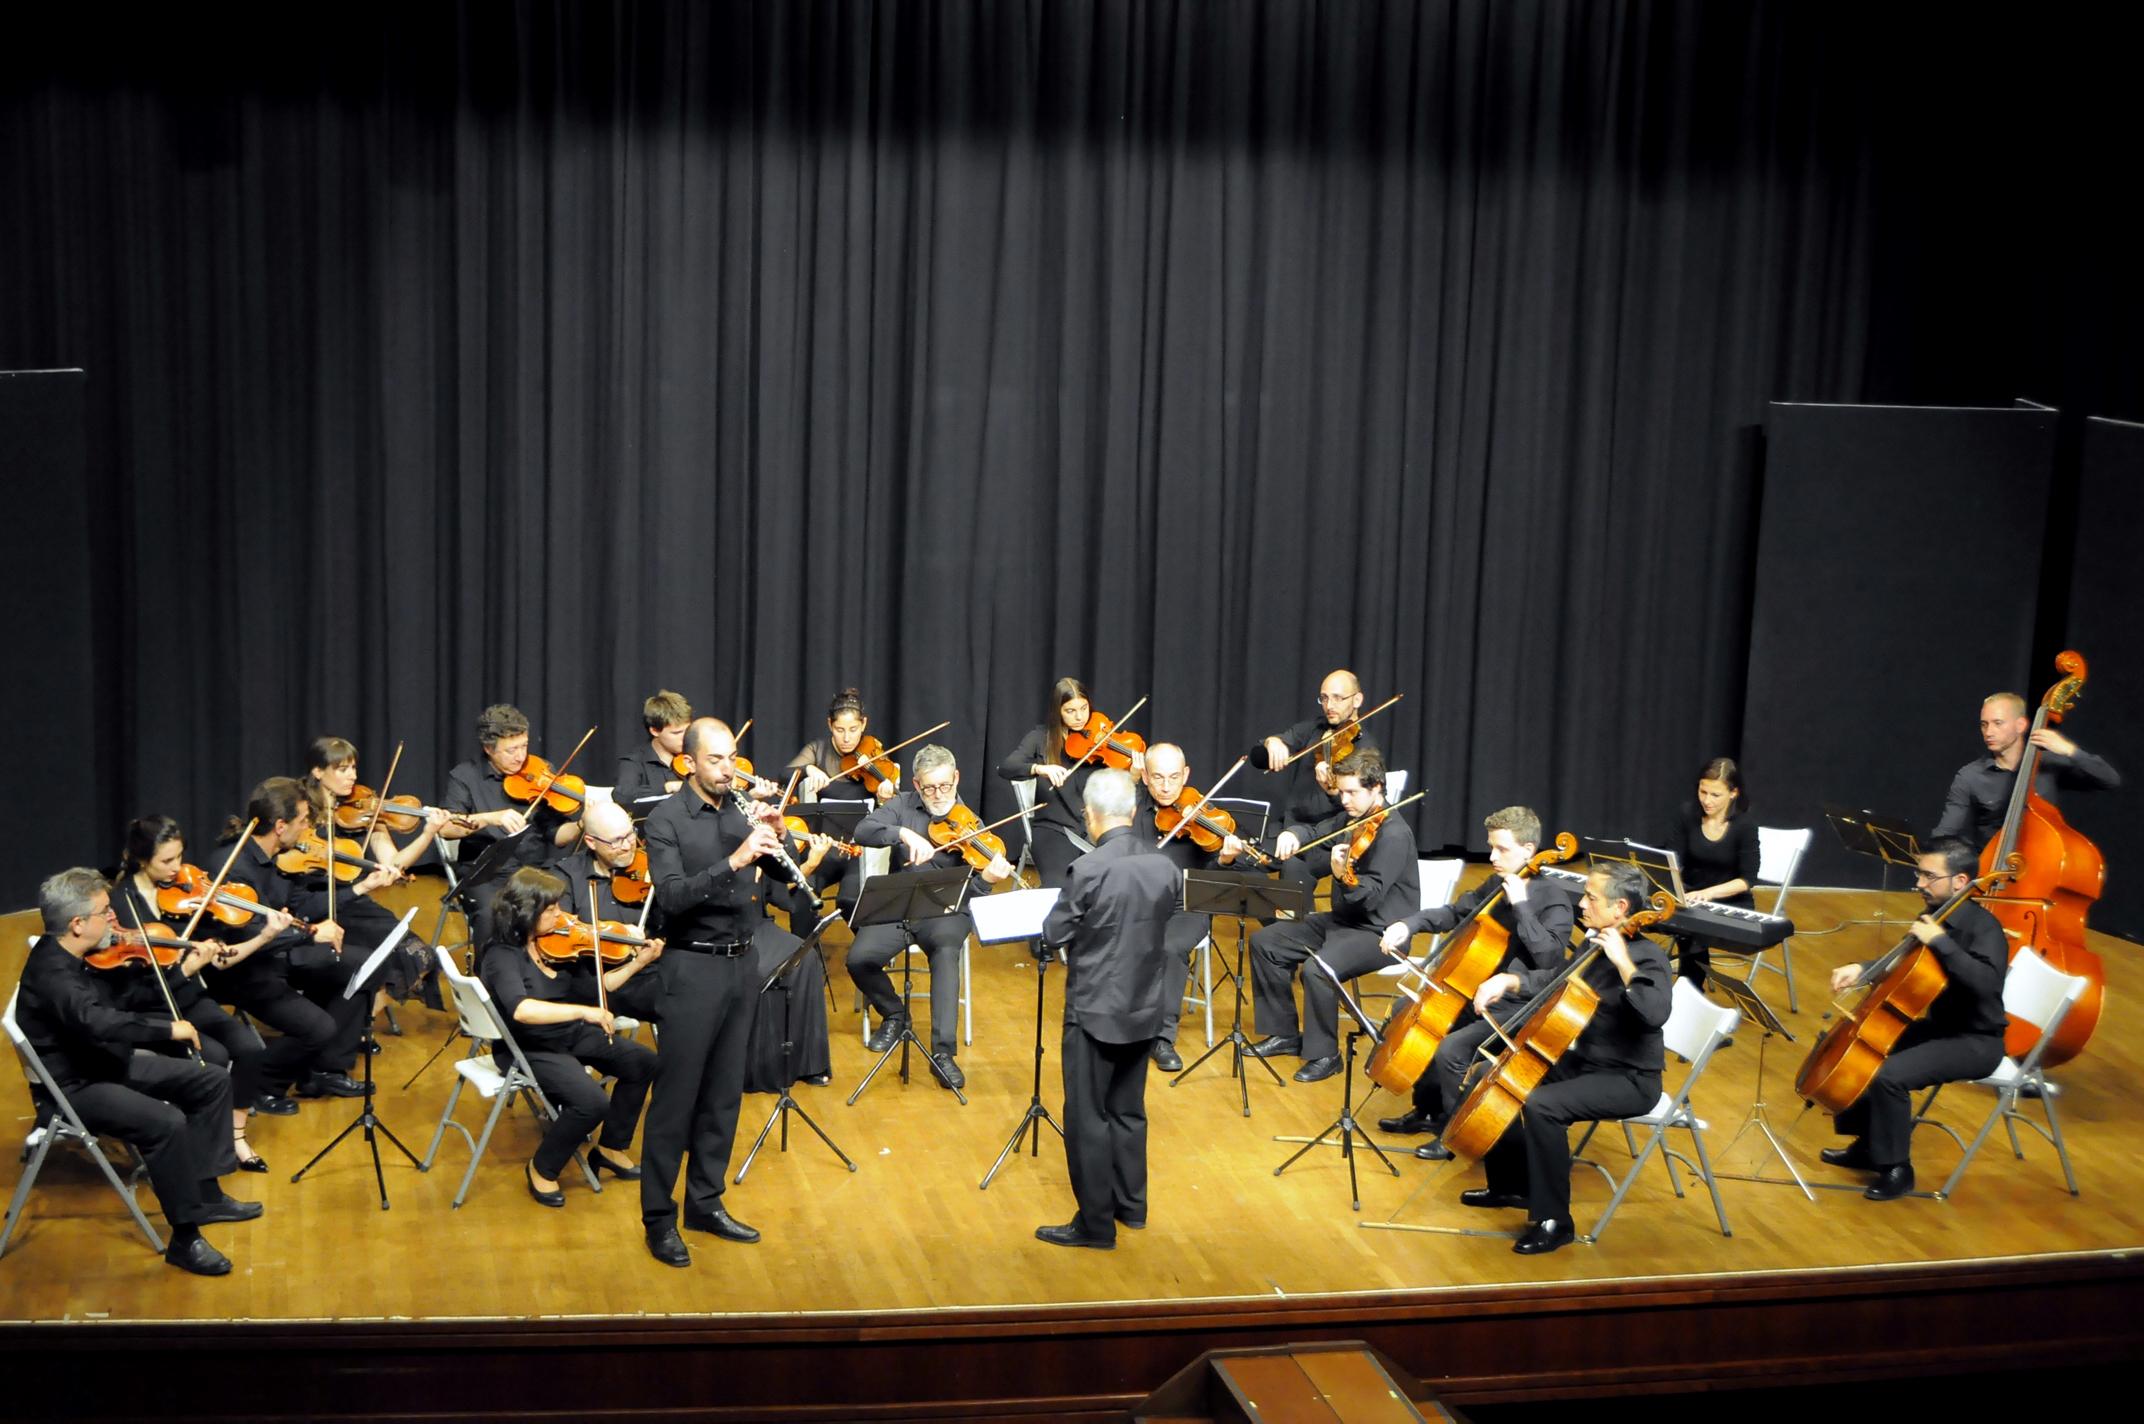 http://orquestatutti.com/wp/wp-content/uploads/2017/05/DSC0054_14_14.jpg